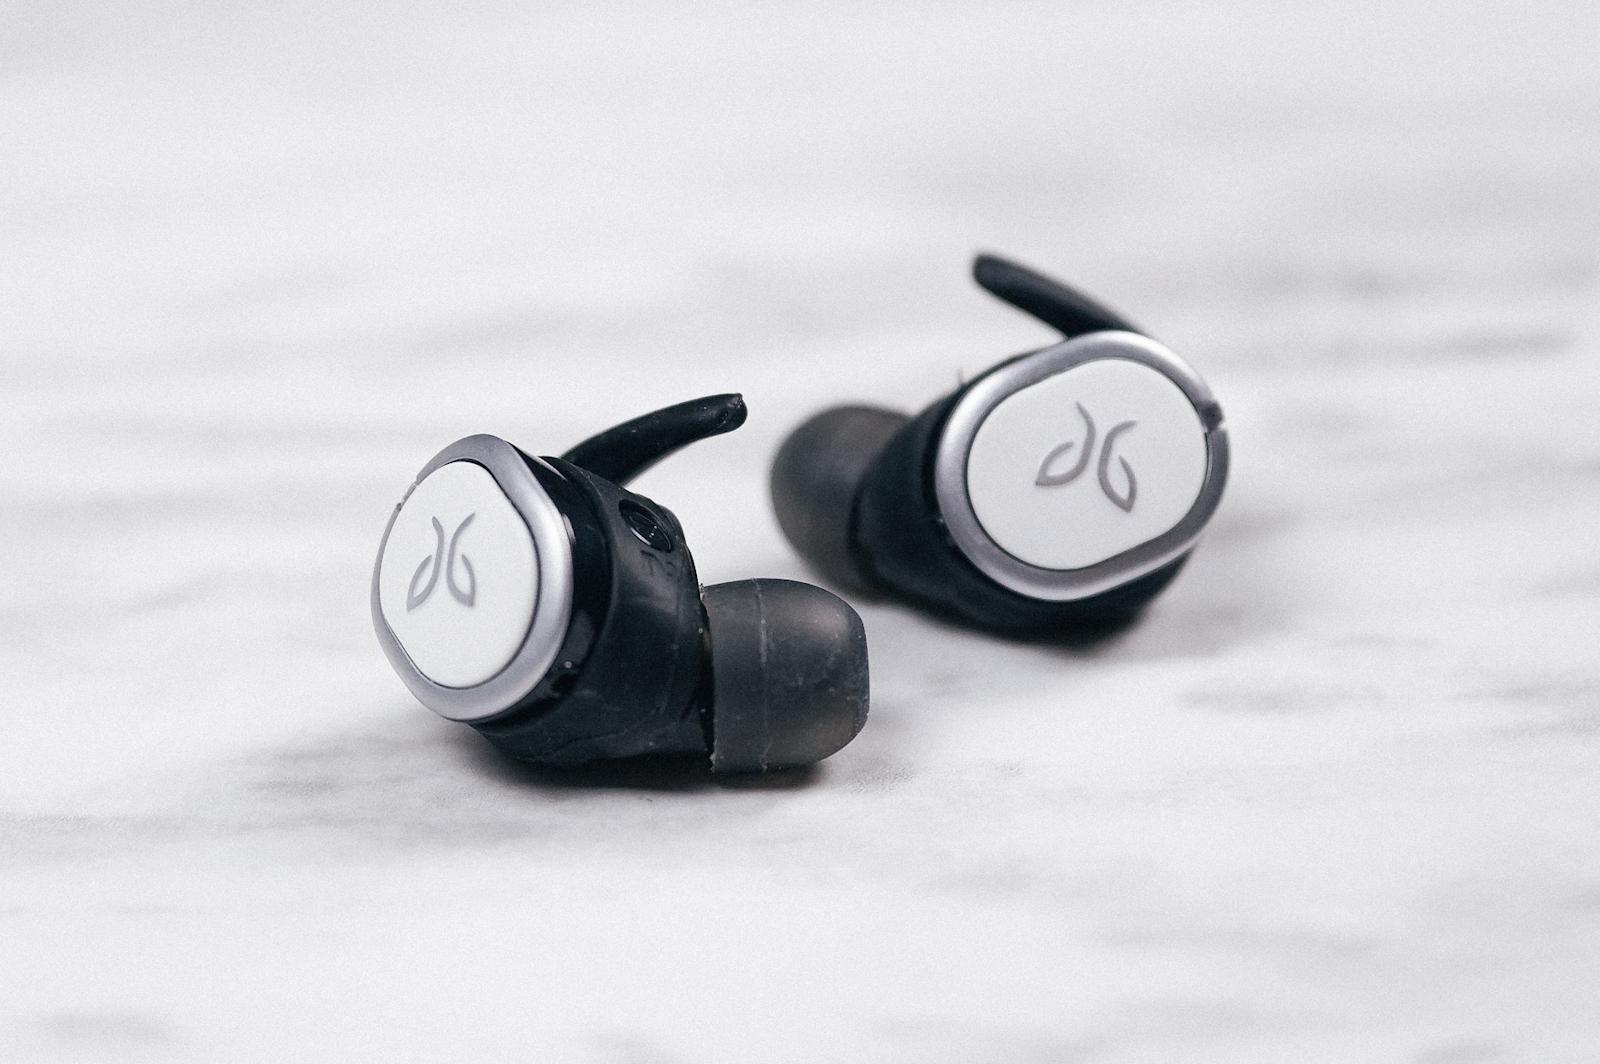 auriculares inalámbricos Jaybird